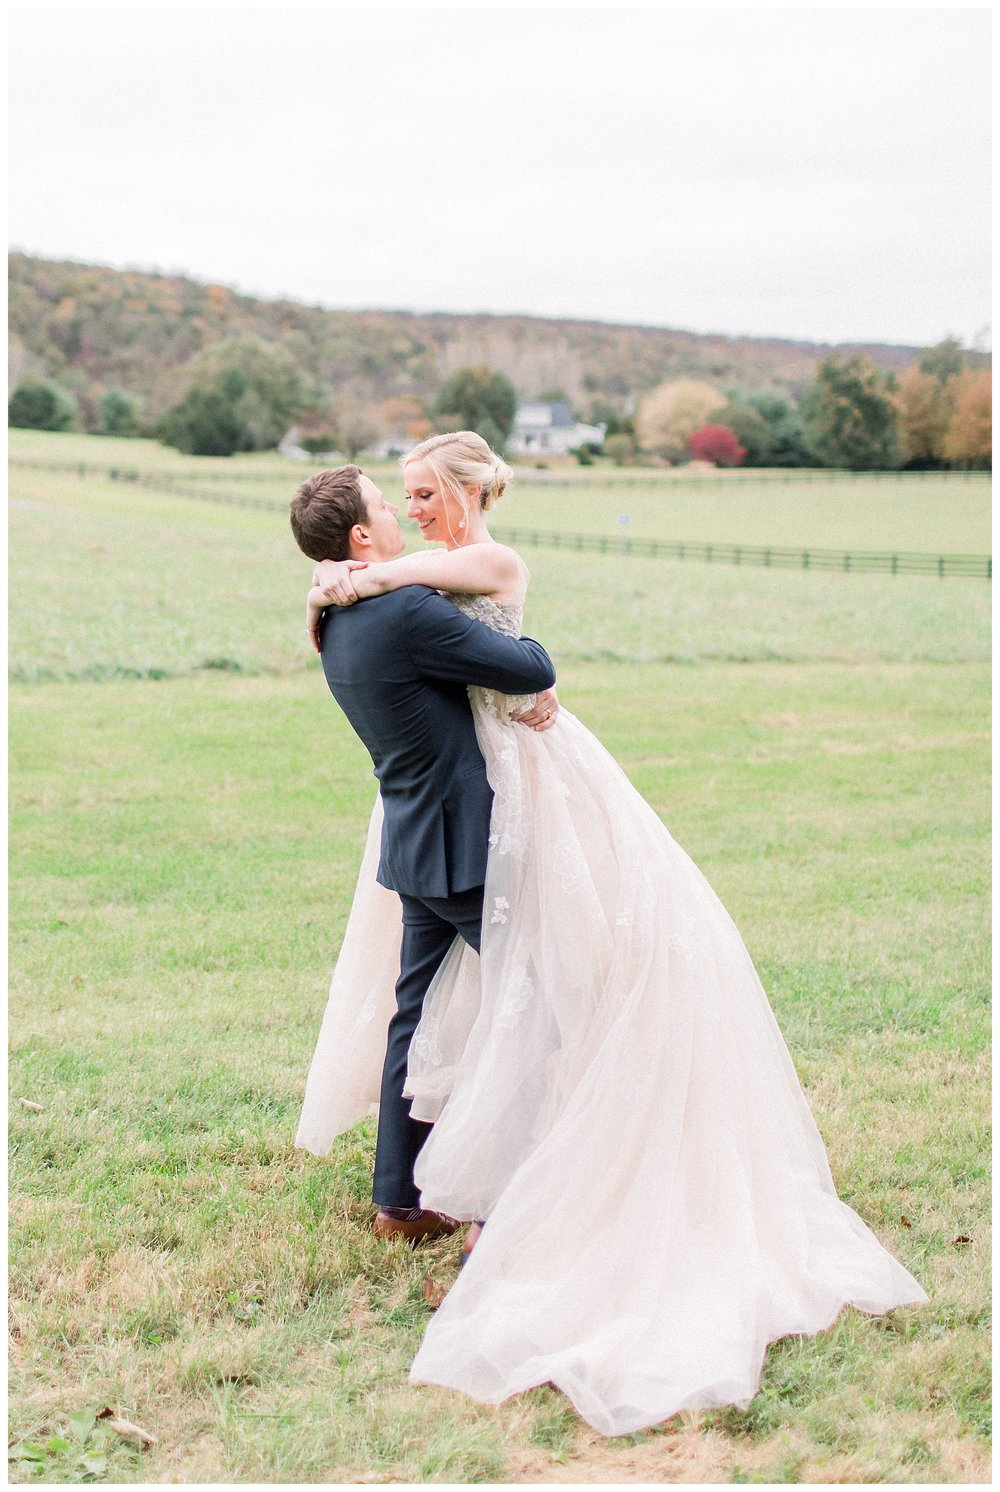 Whitehall Estate Wedding | Northern Virginia Wedding Photographer Kir Tuben_0095.jpg